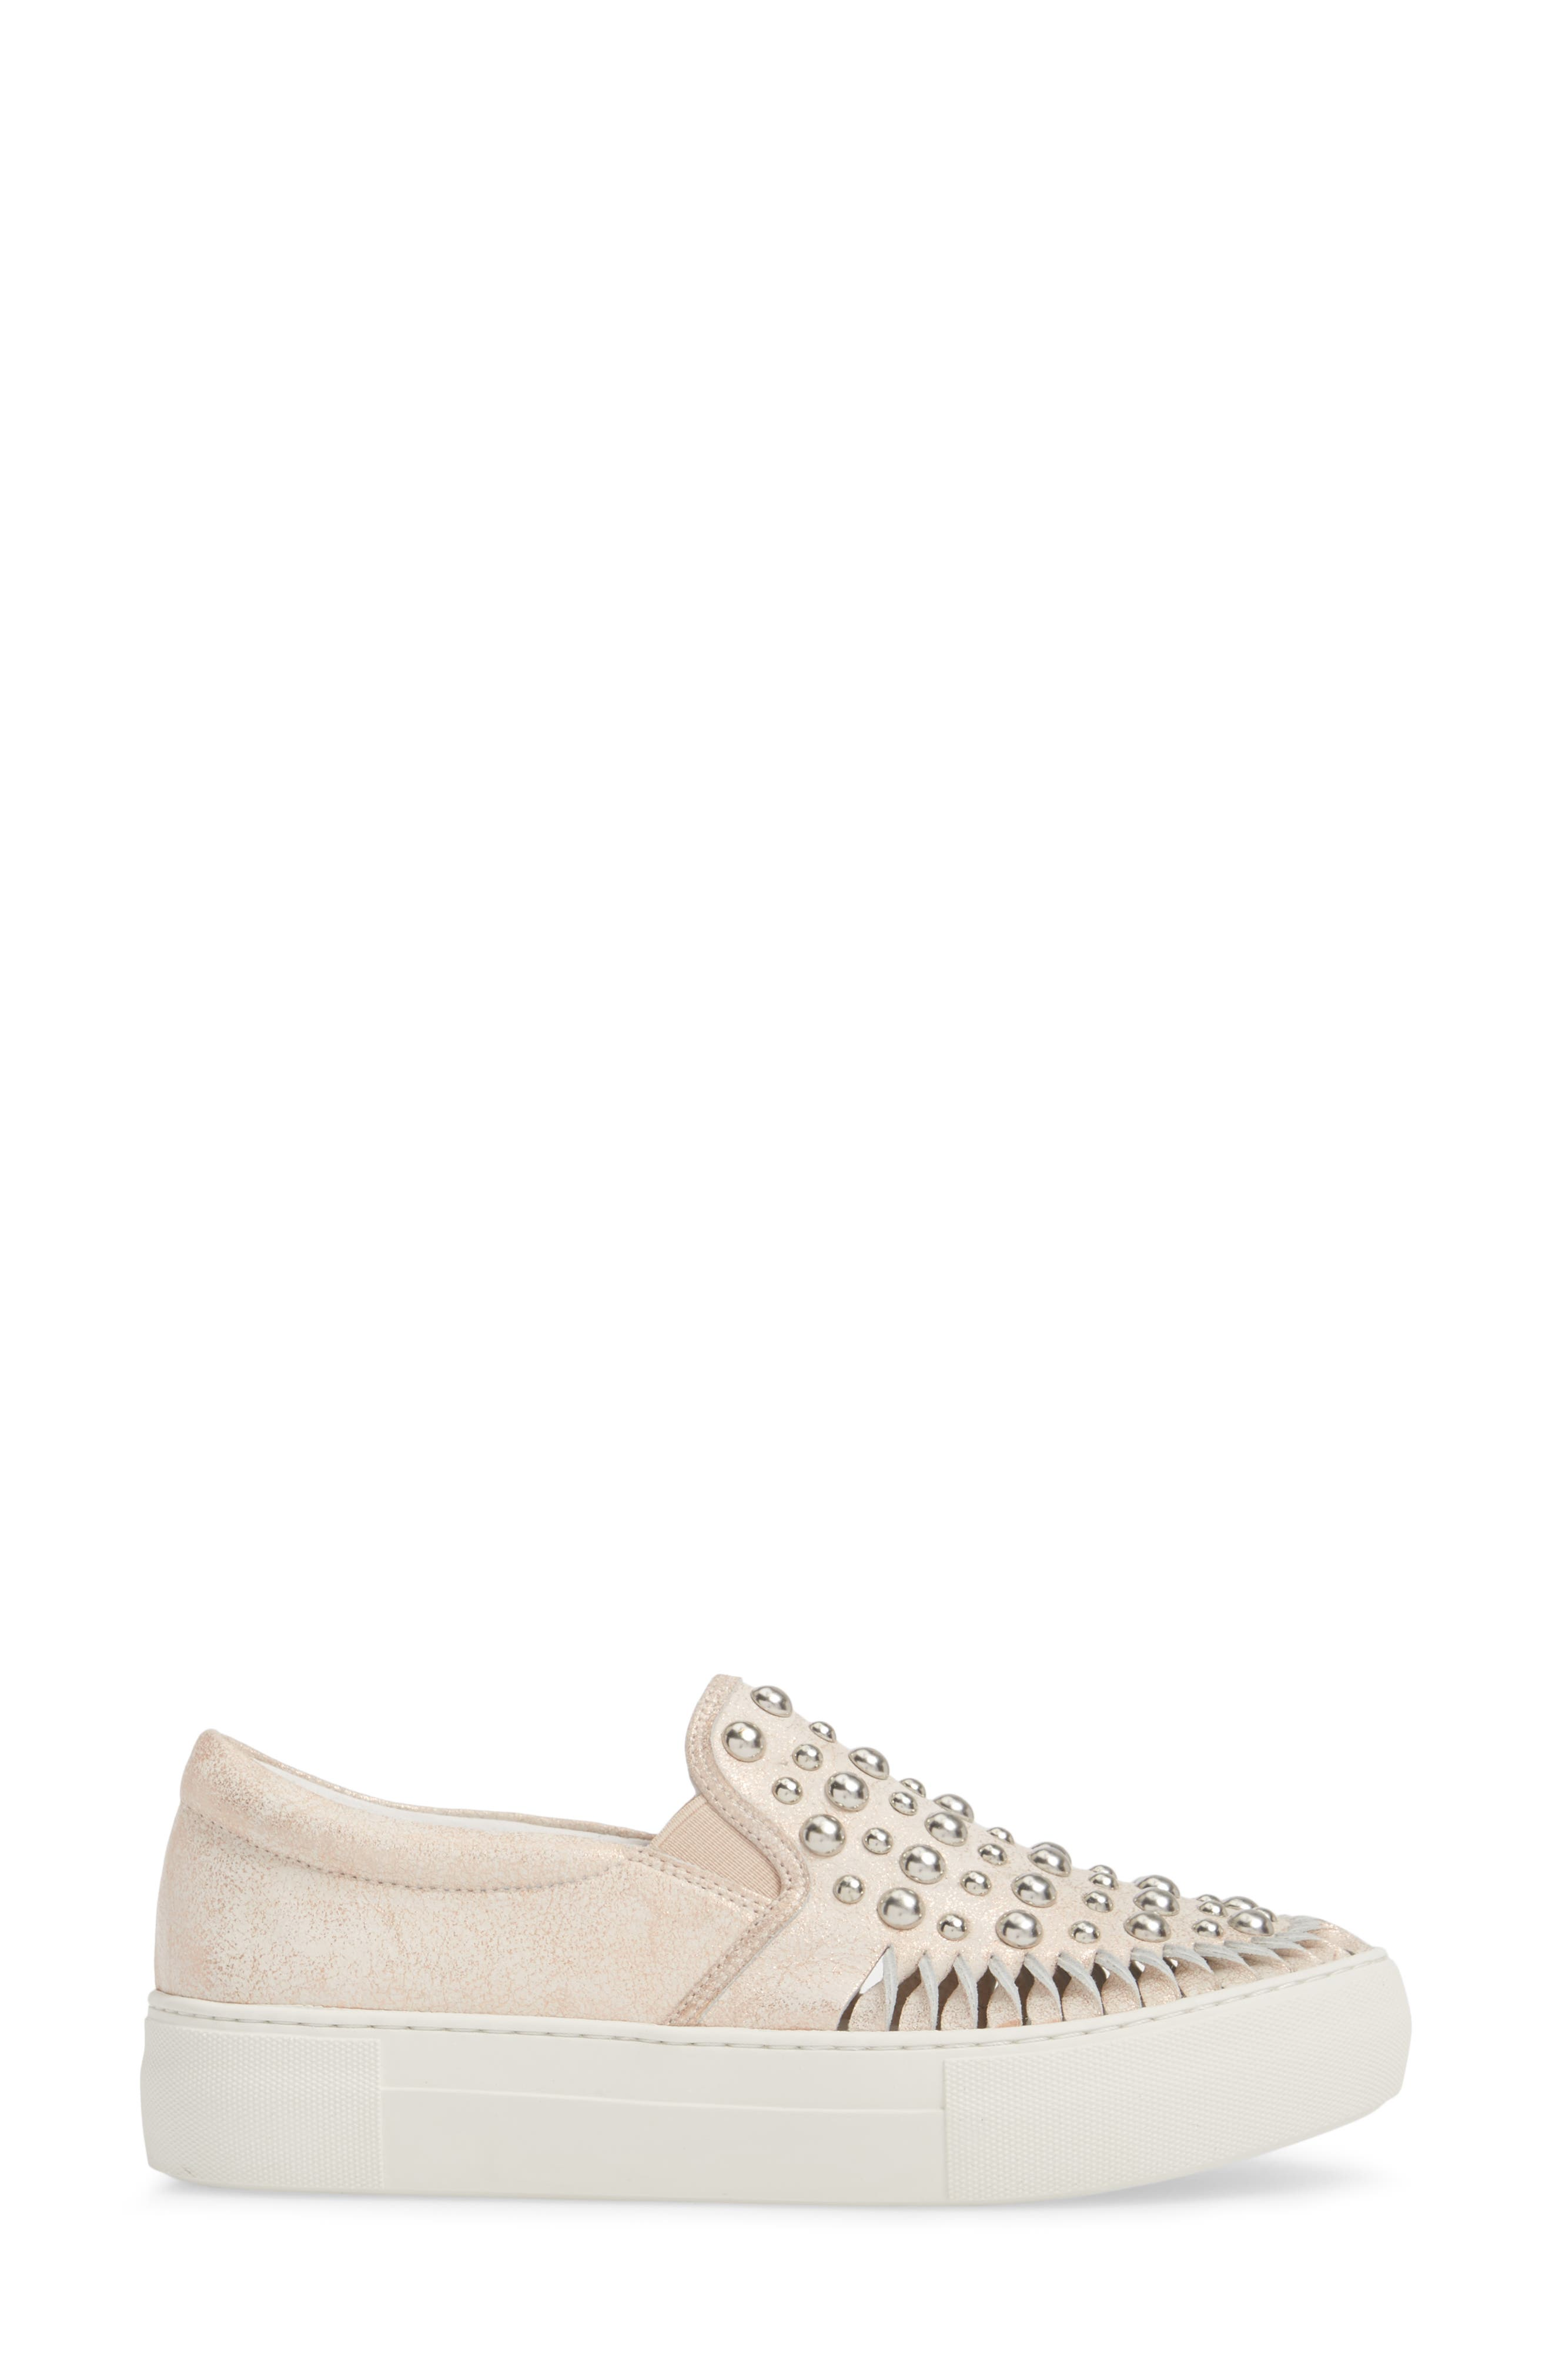 AZT Studded Slip-On Sneaker,                             Alternate thumbnail 3, color,                             Soft Pink Metallic Leather